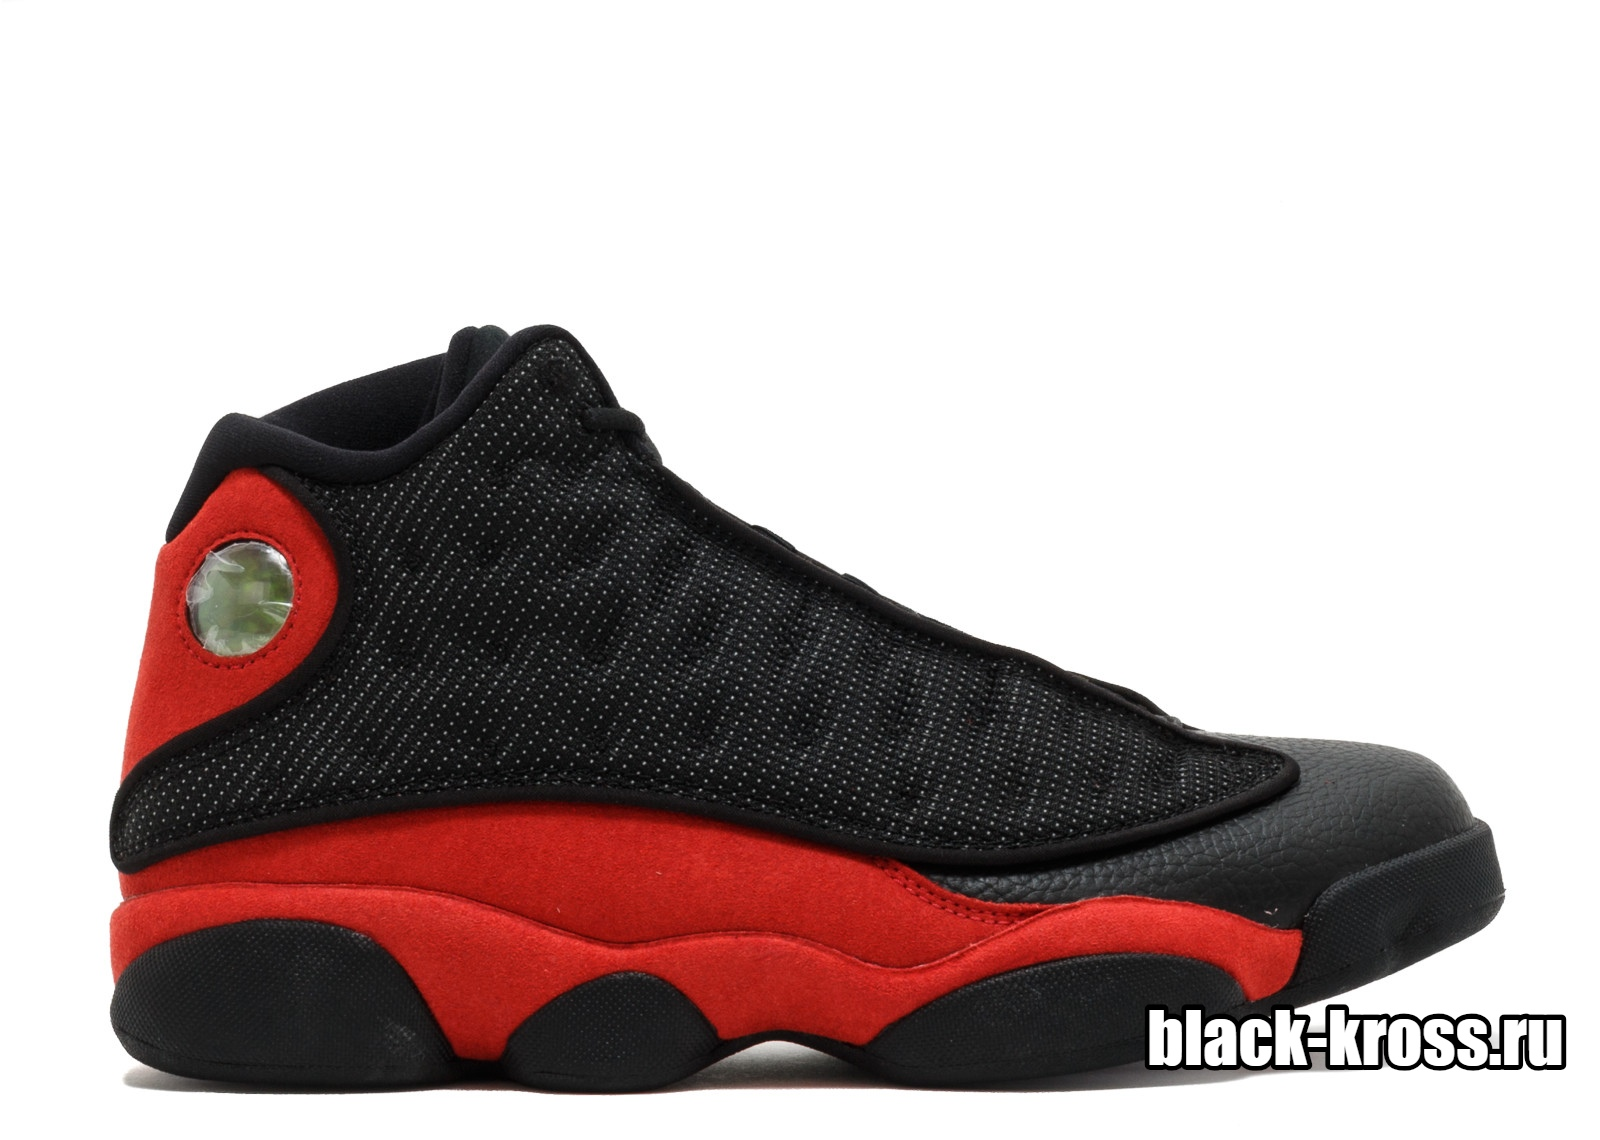 NIKE AIR JORDAN XIII RETRO Black & Red (41-46)